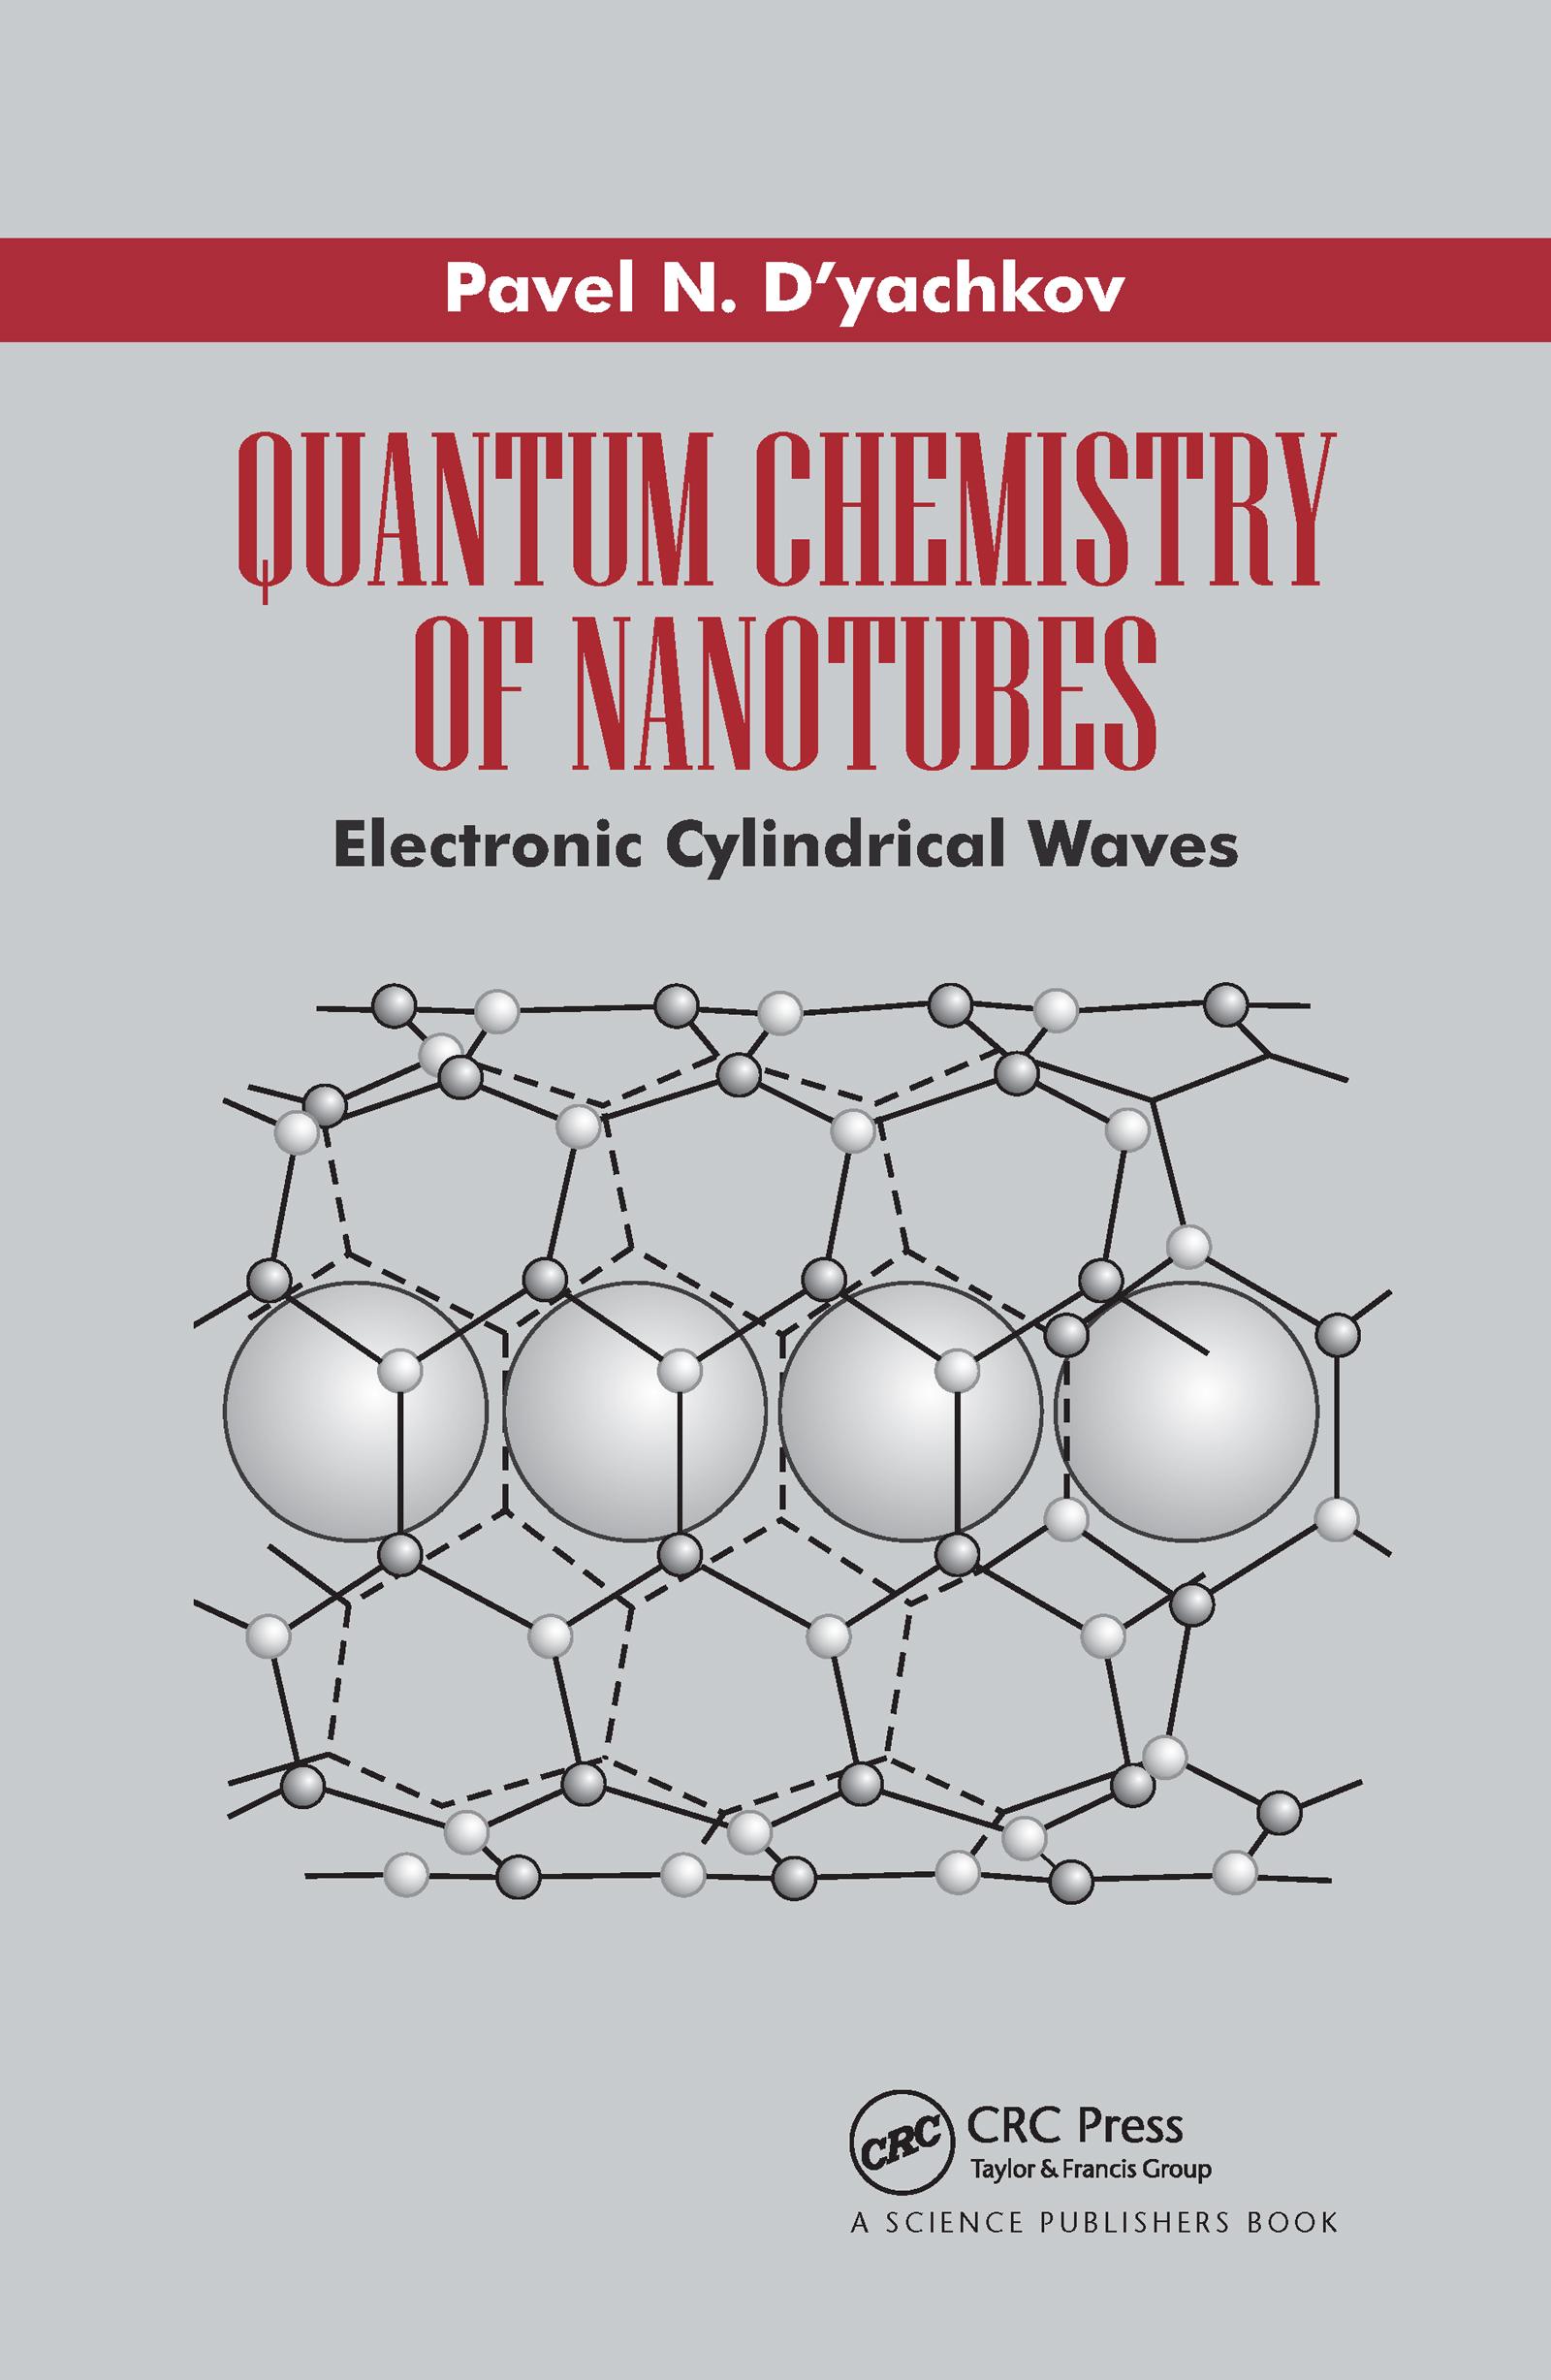 Quantum Chemistry of Nanotubes